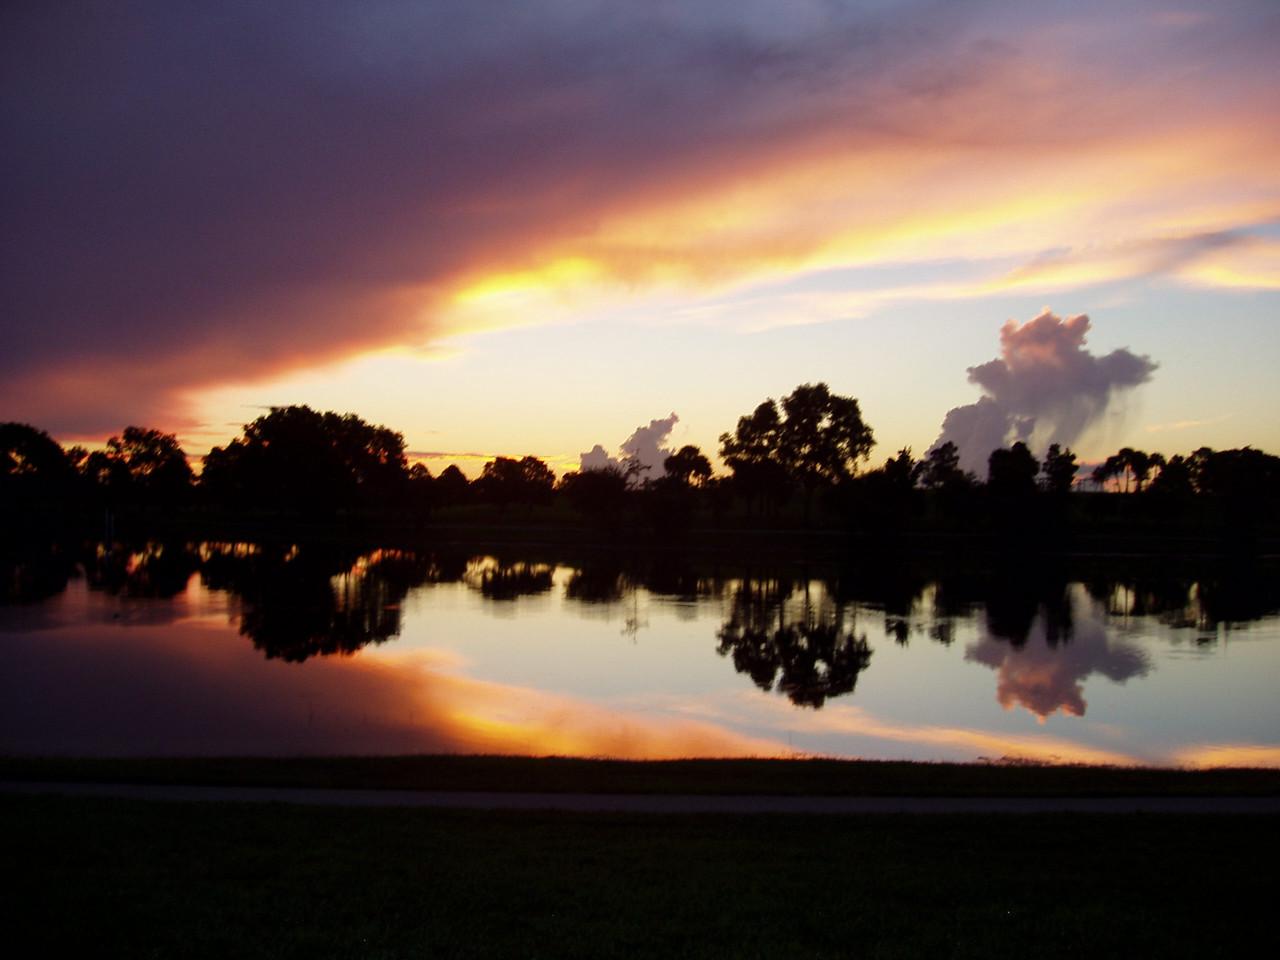 Sunrise, morning walk at Okeeheelee<br /> PHOTO by Paul Cummings